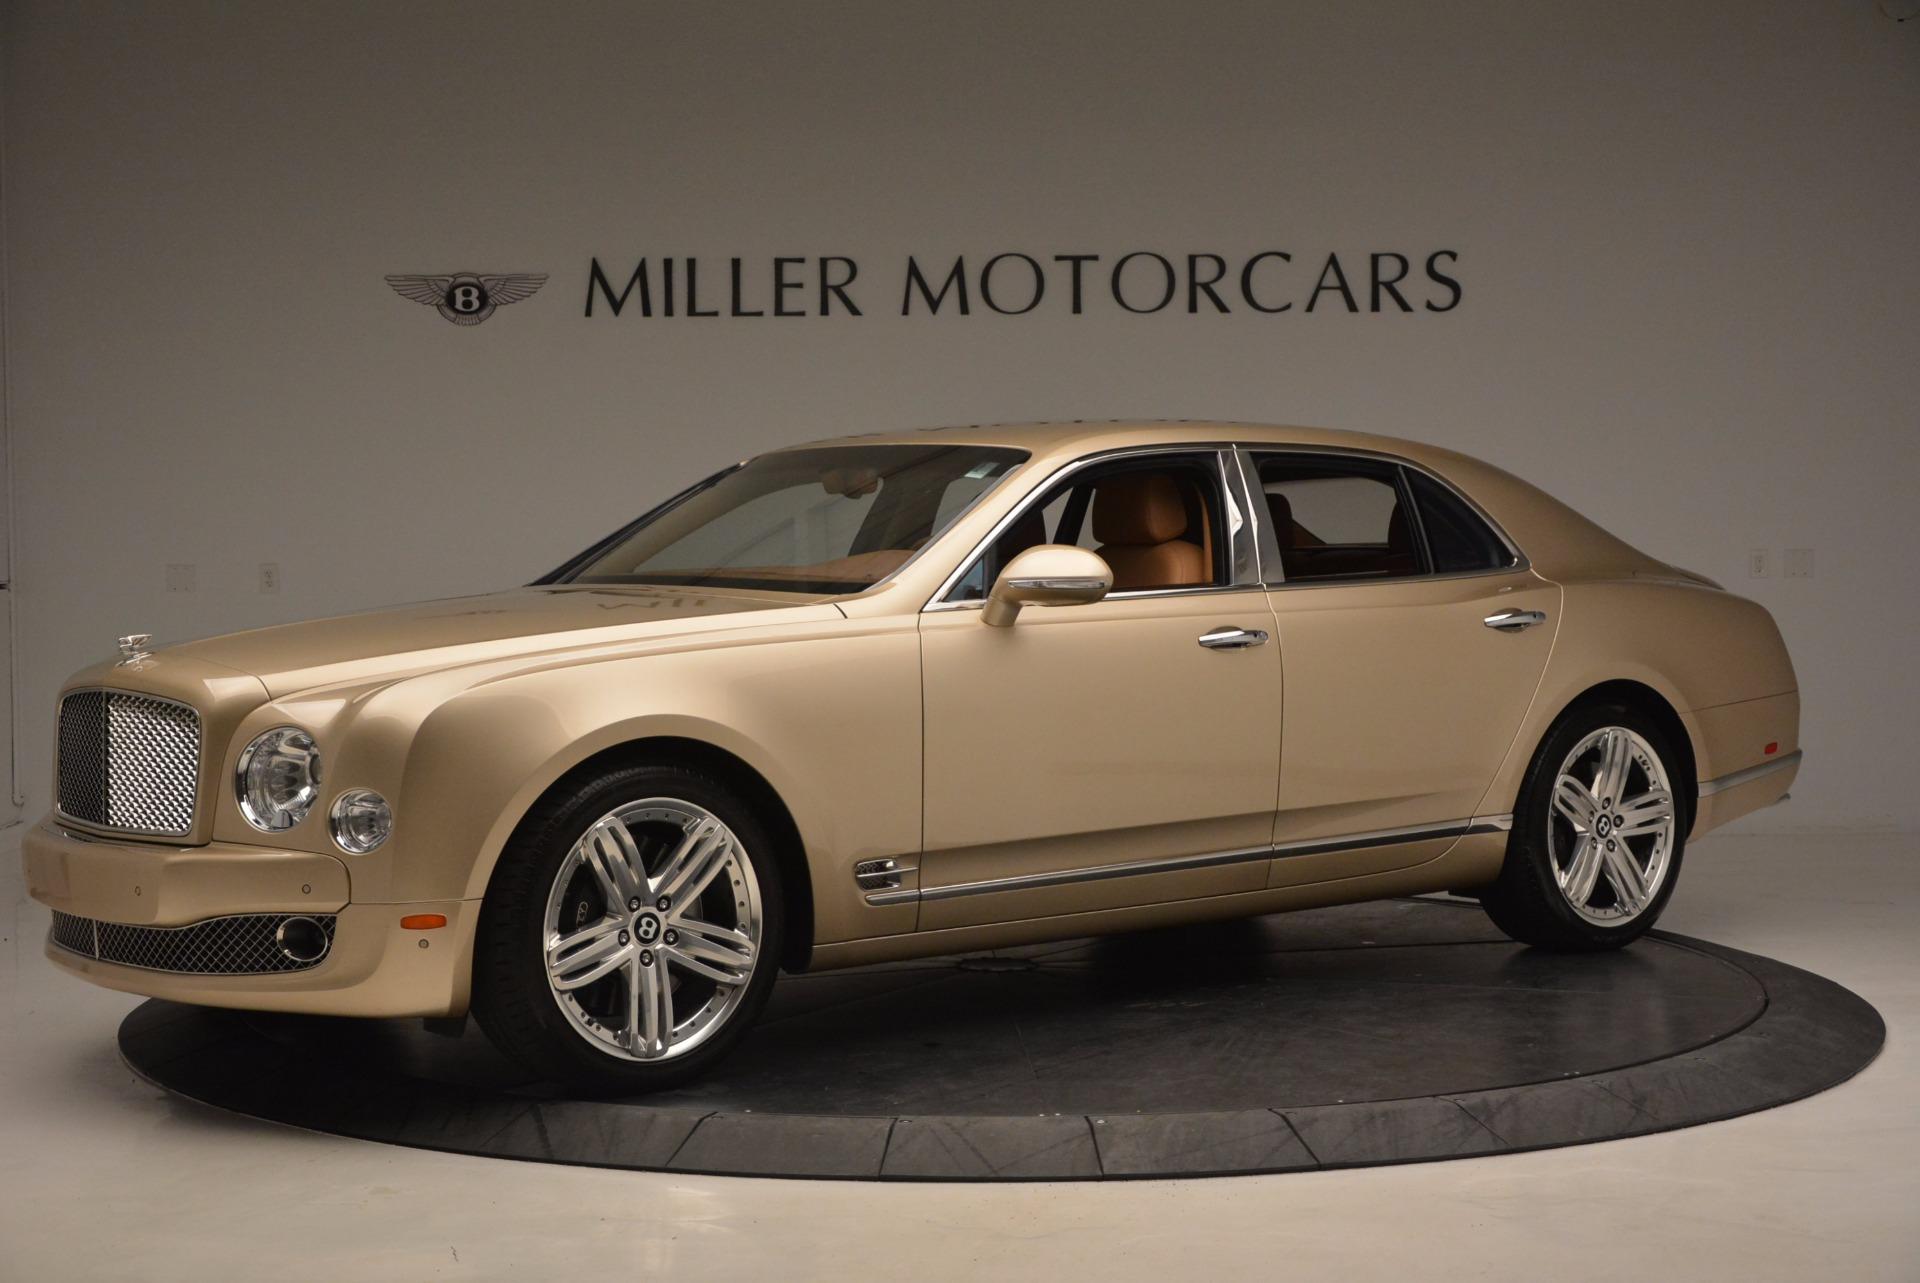 Used 2011 Bentley Mulsanne  For Sale In Westport, CT 1081_p2